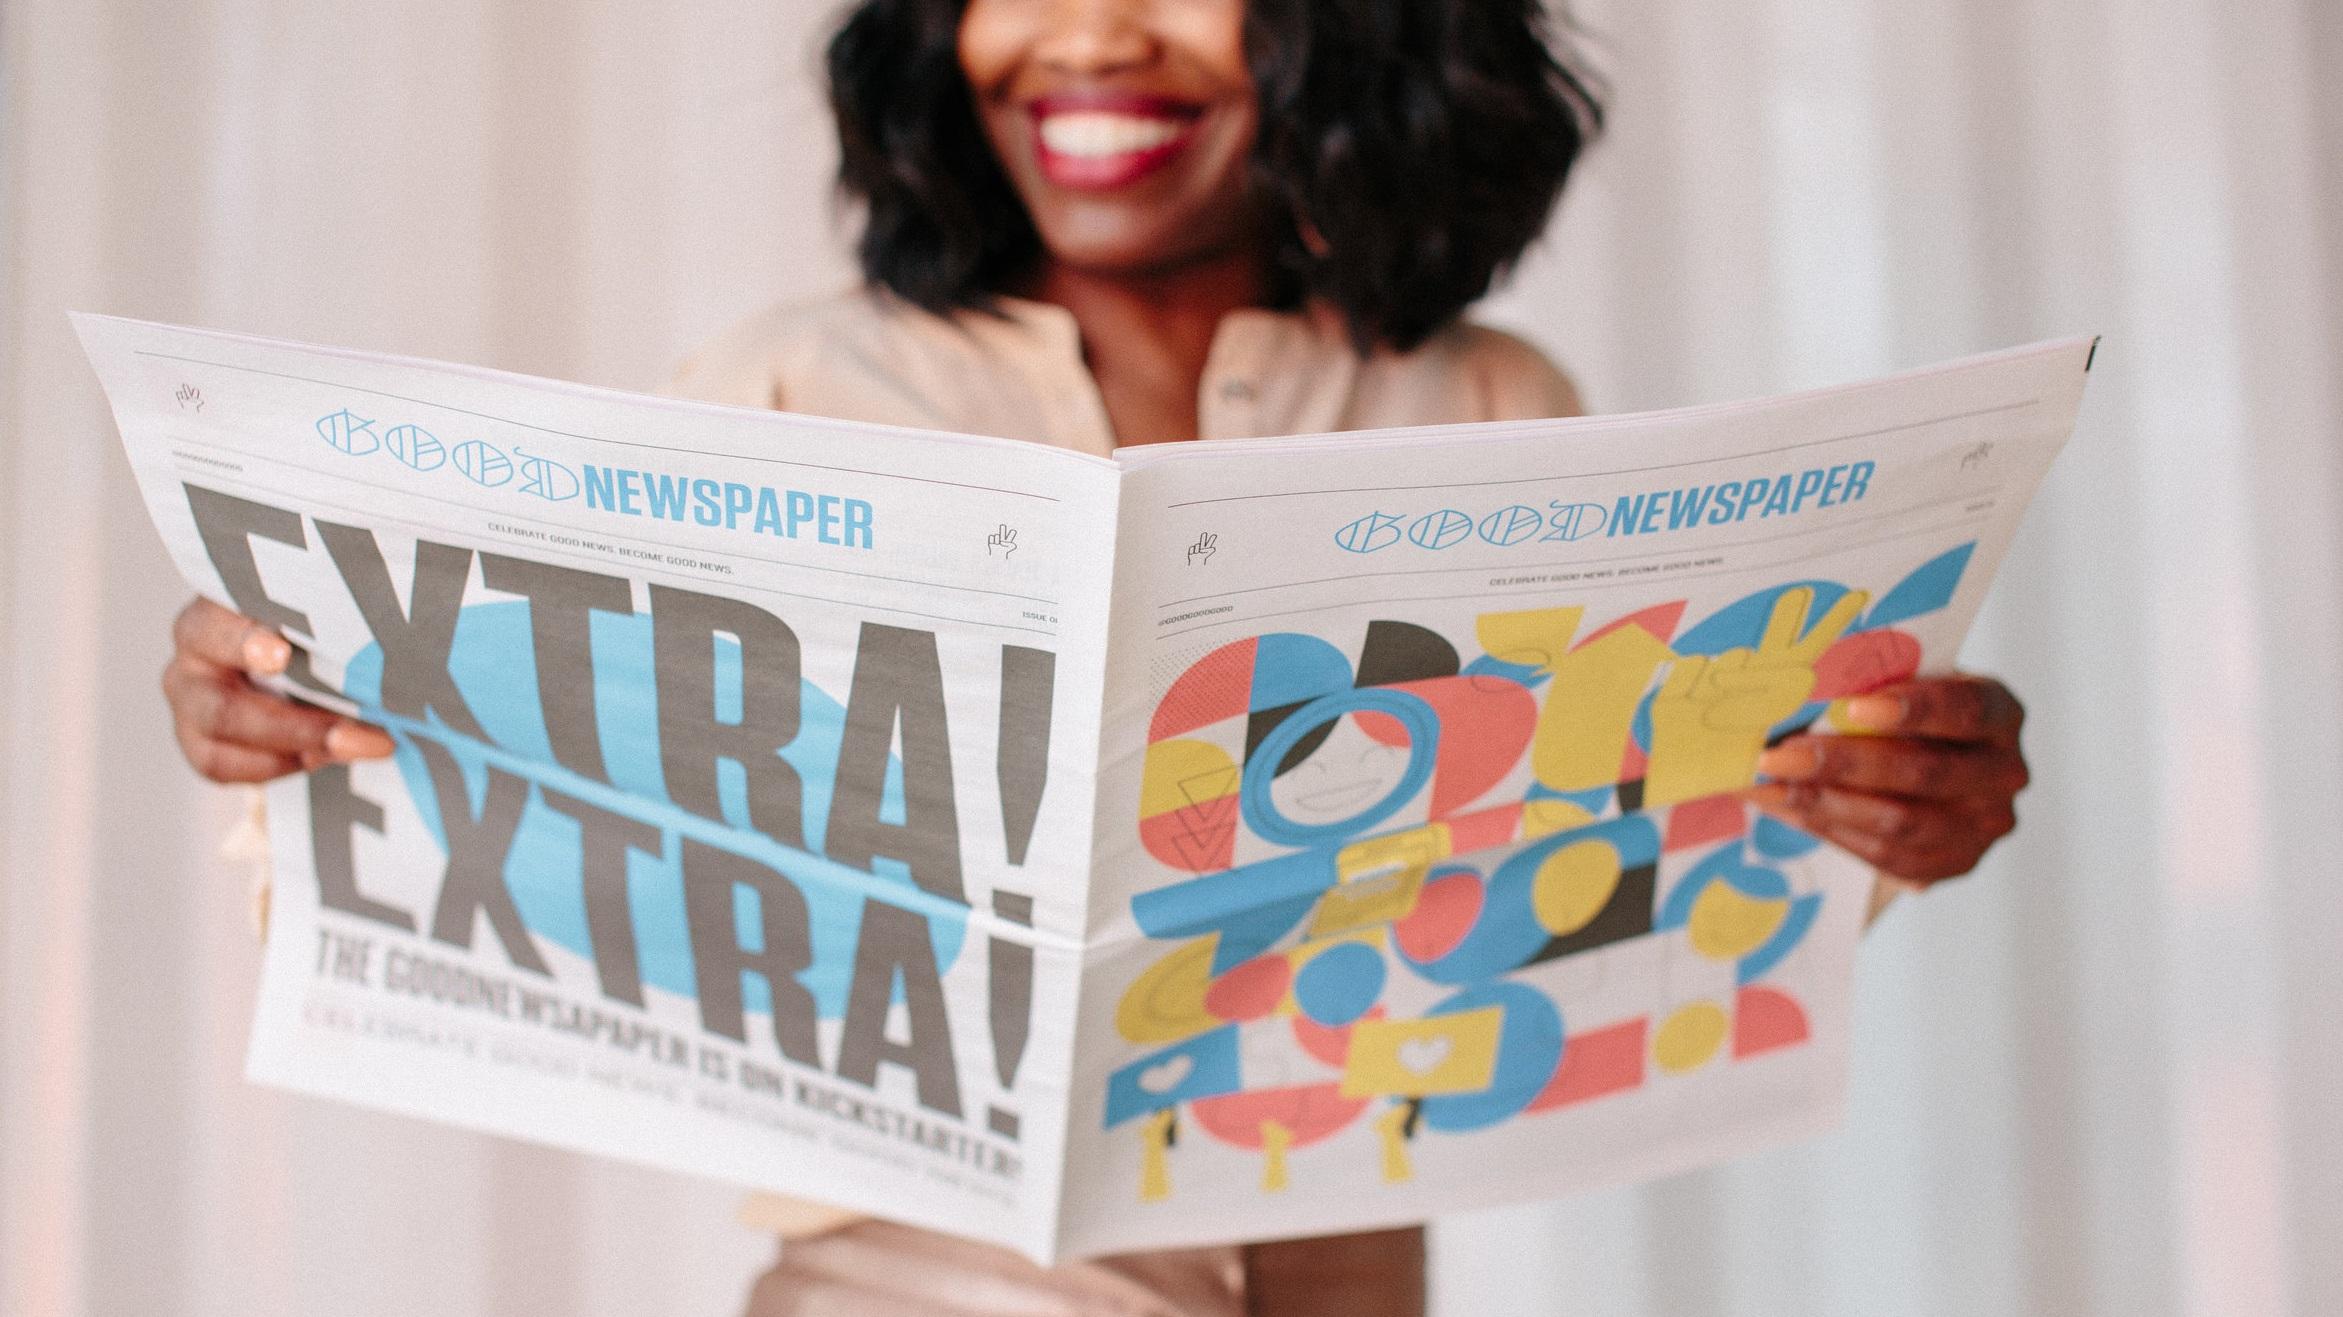 Goodnewspaper - Good Good Good - Good News Paper - Happy News